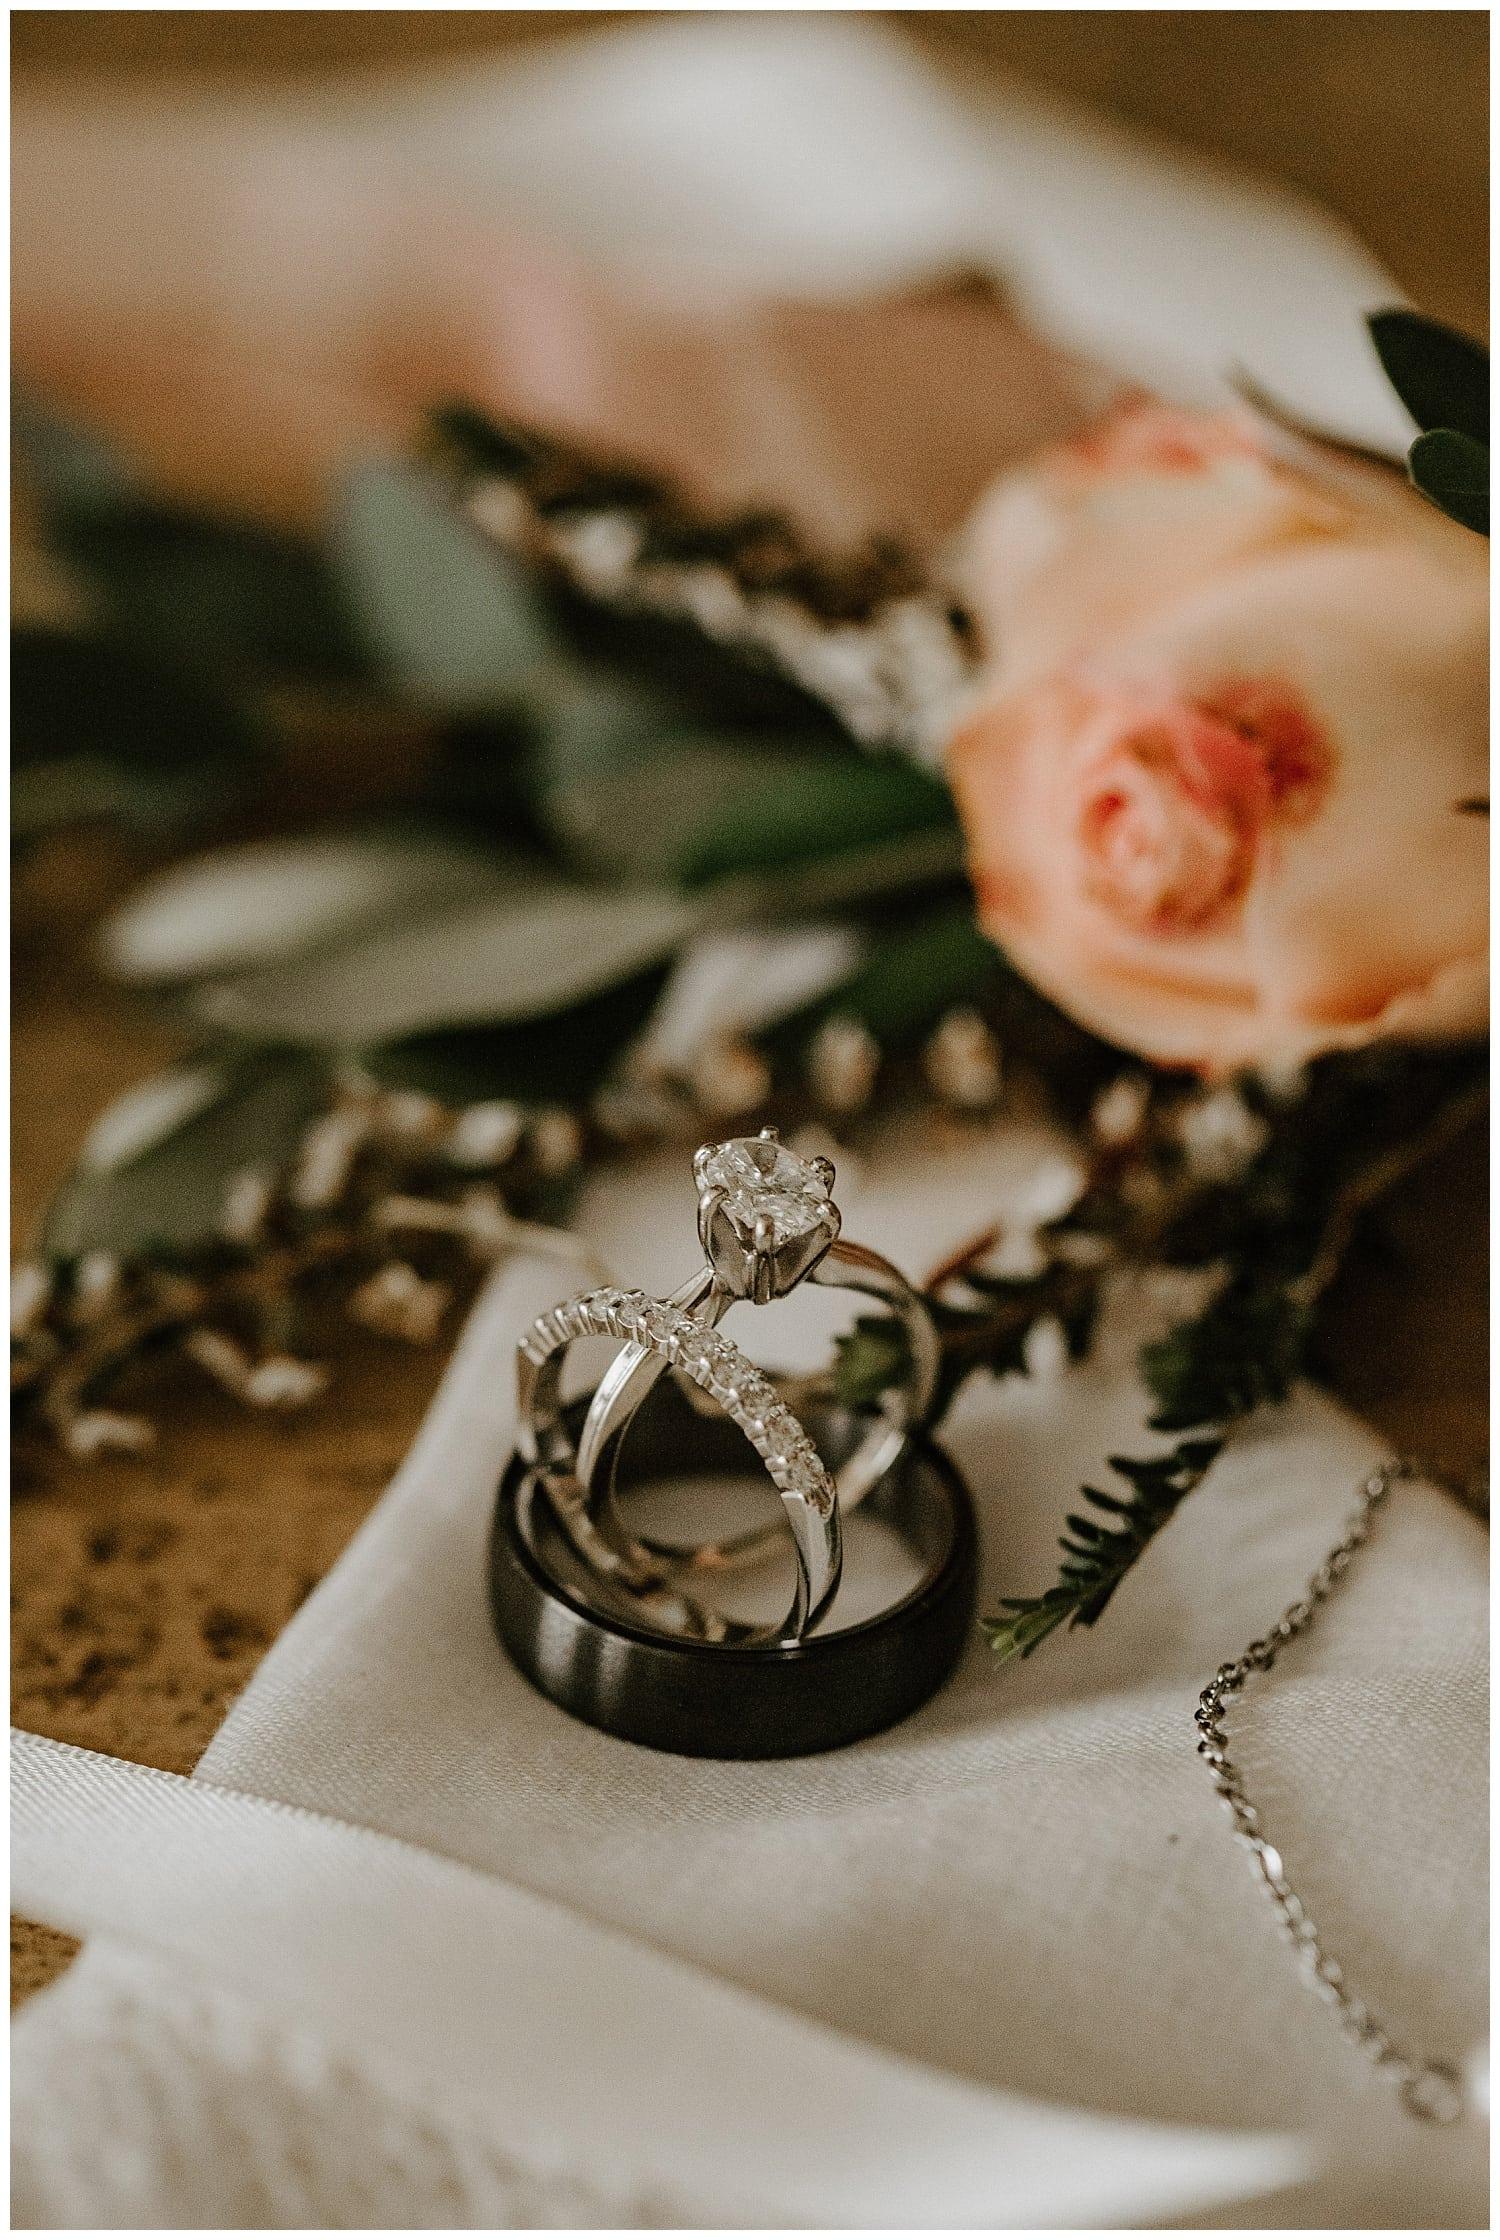 asheville elopement,asheville wedding photographer,carnegie resort wedding,carver's gap elopement,knoxville wedding photographer,nashville wedding photographer,roan mountain elopement,roan mountain wedding,